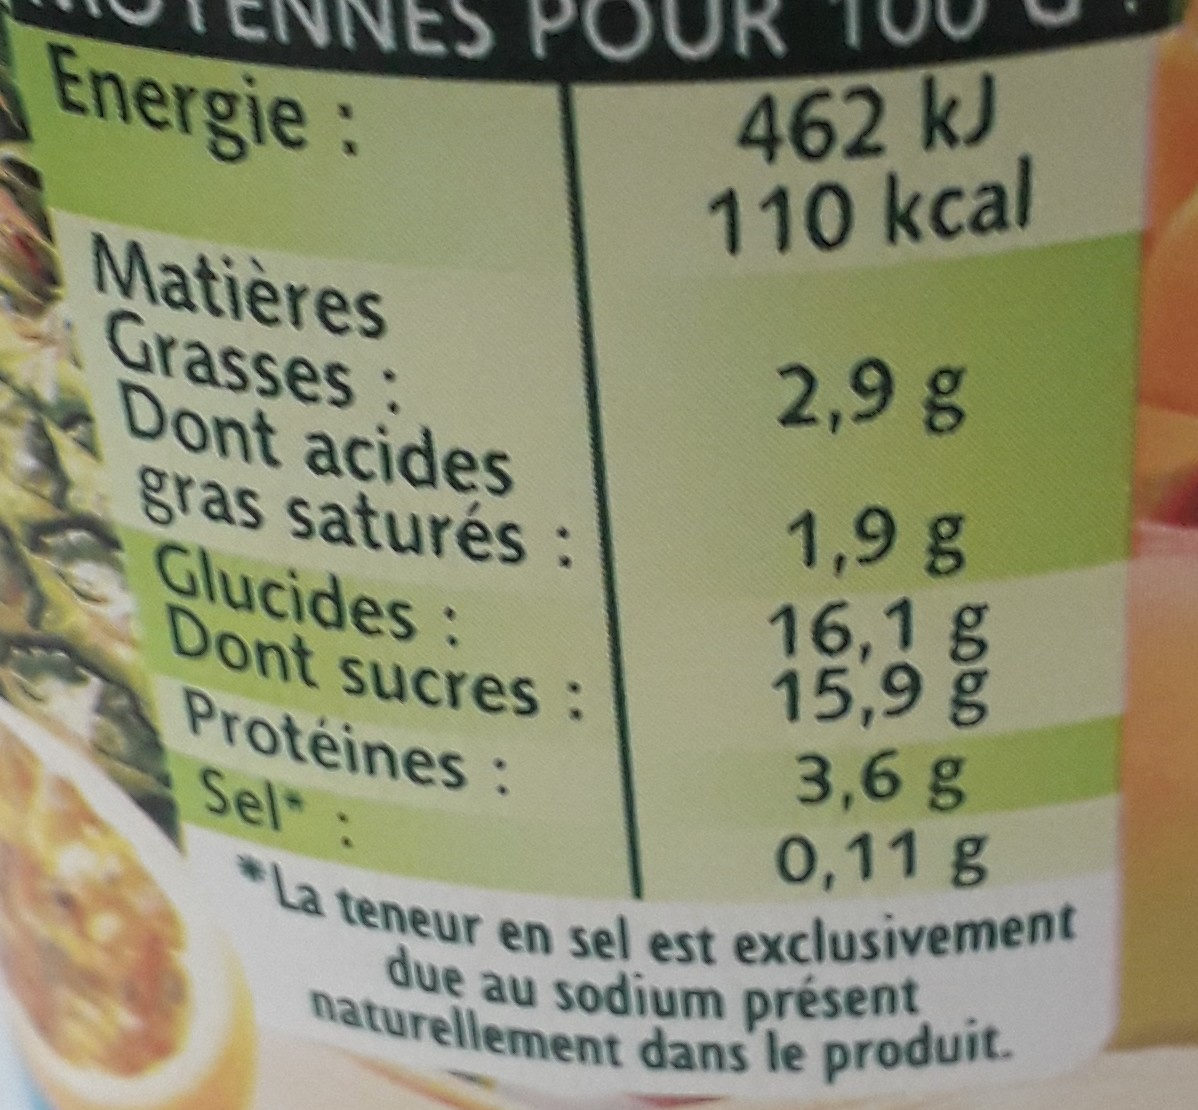 Panier tropical - Informations nutritionnelles - fr